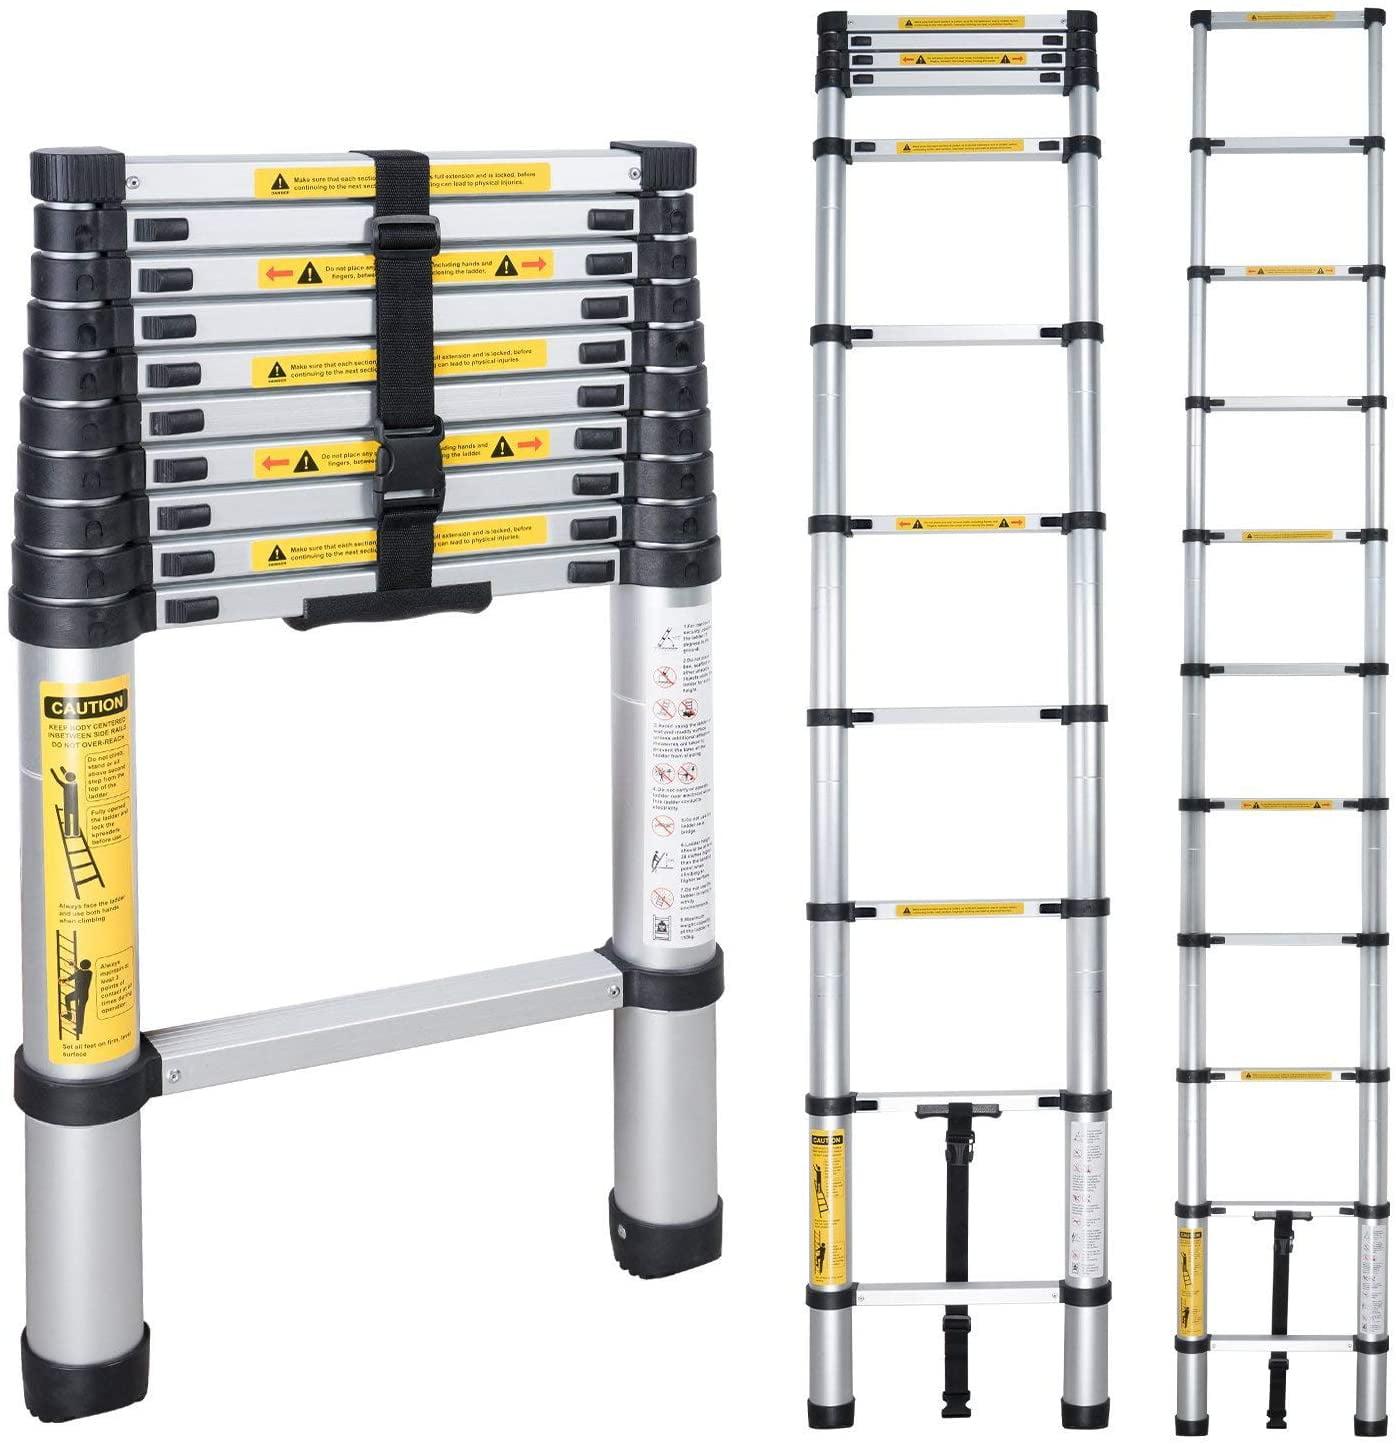 Folding Portable Extension Ladder 10.5 FT Aluminum Stretchable Ladder